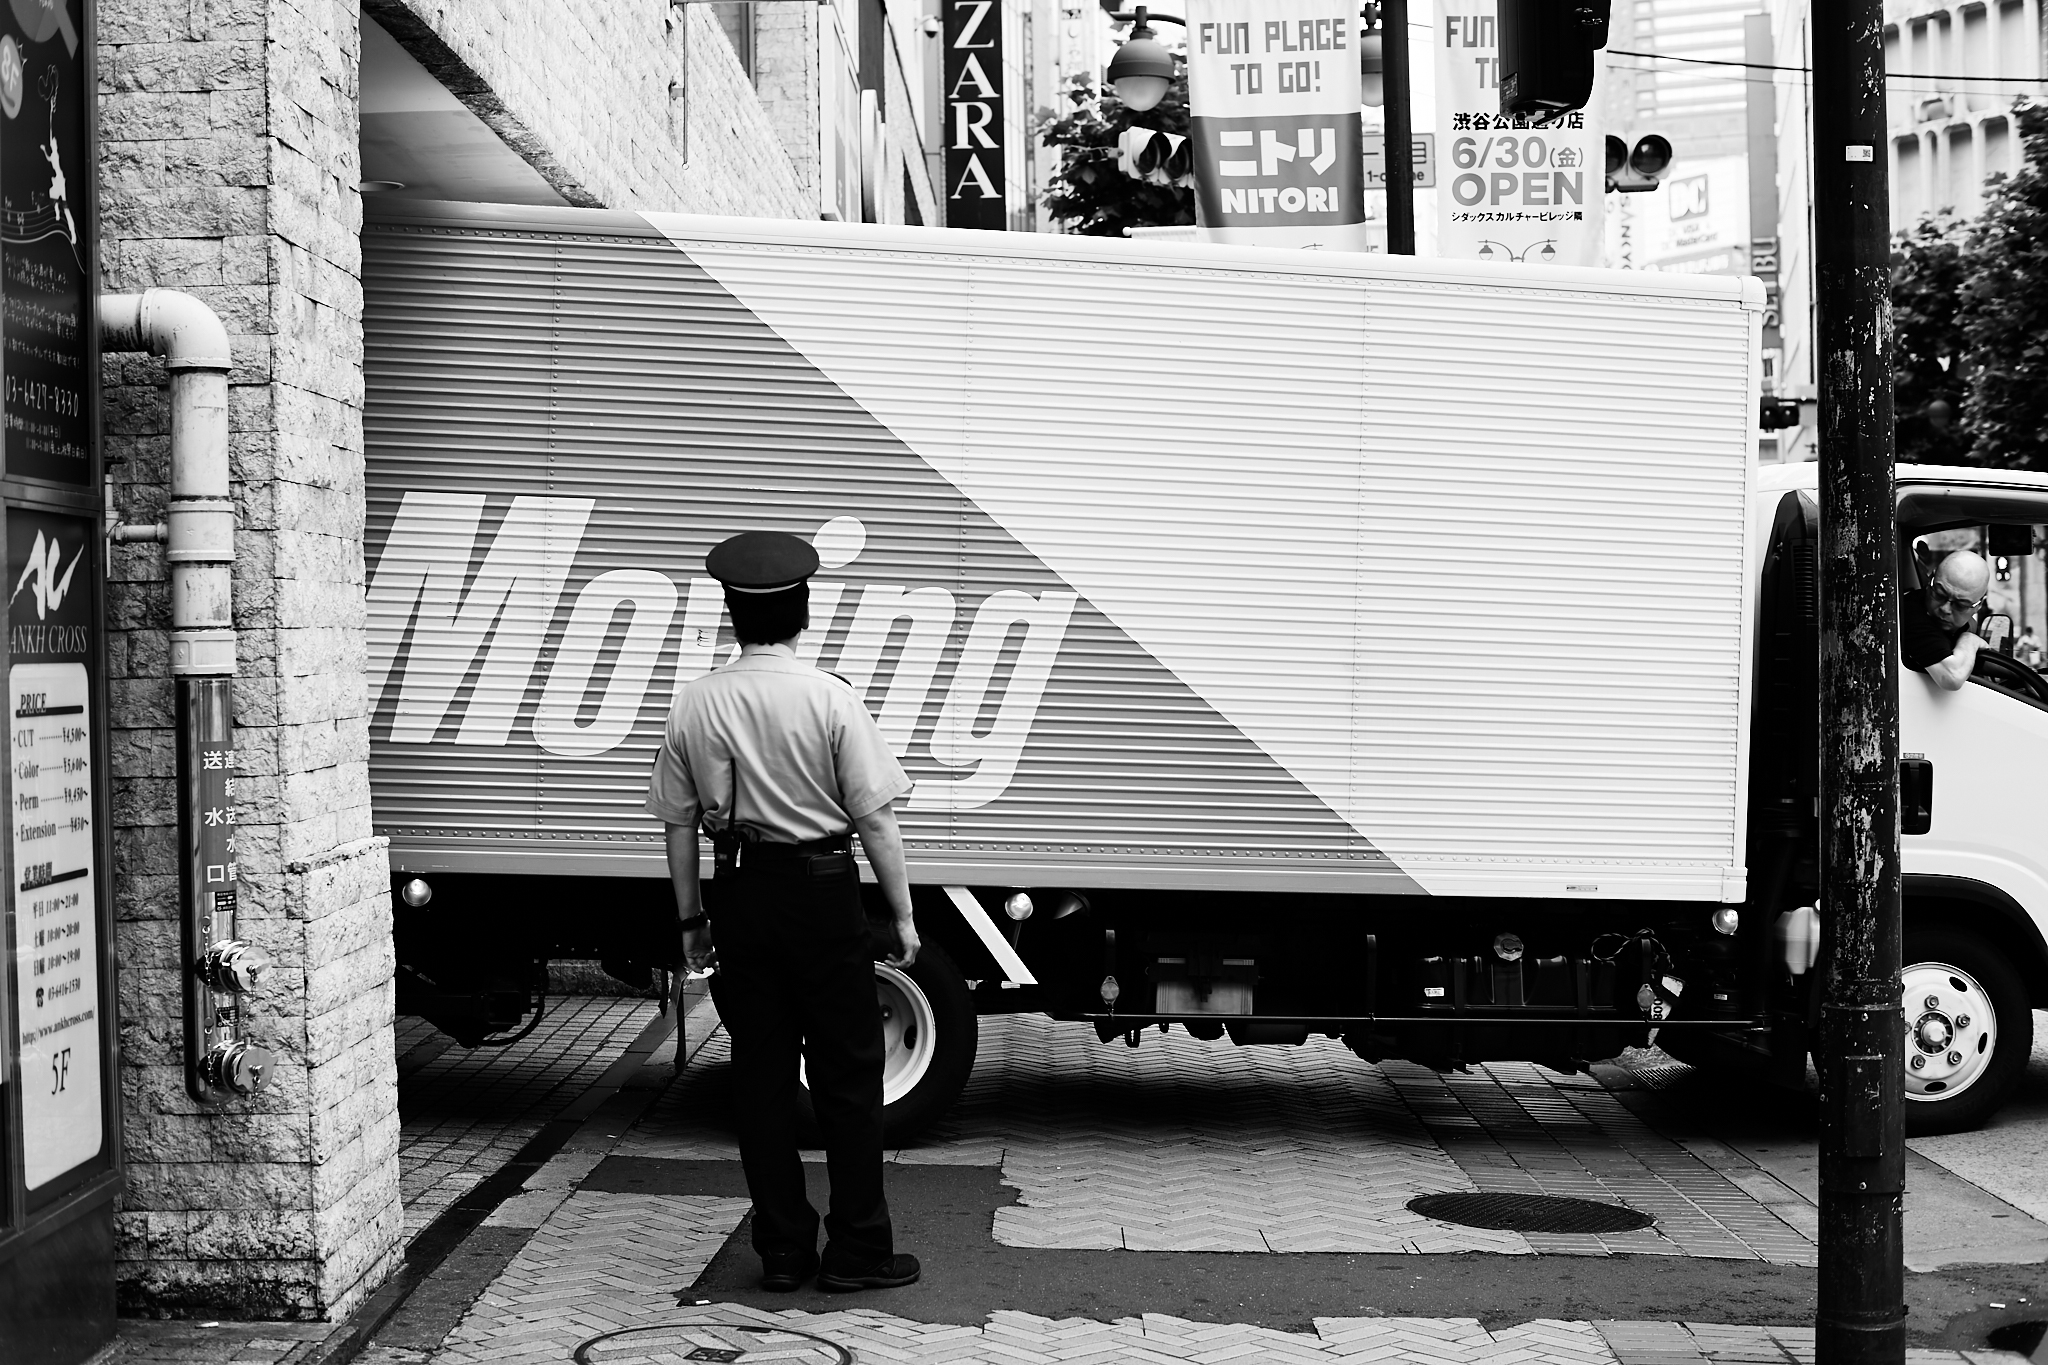 SnapPilots_17-07-01_Tokyo2017_bnw_04.jpg